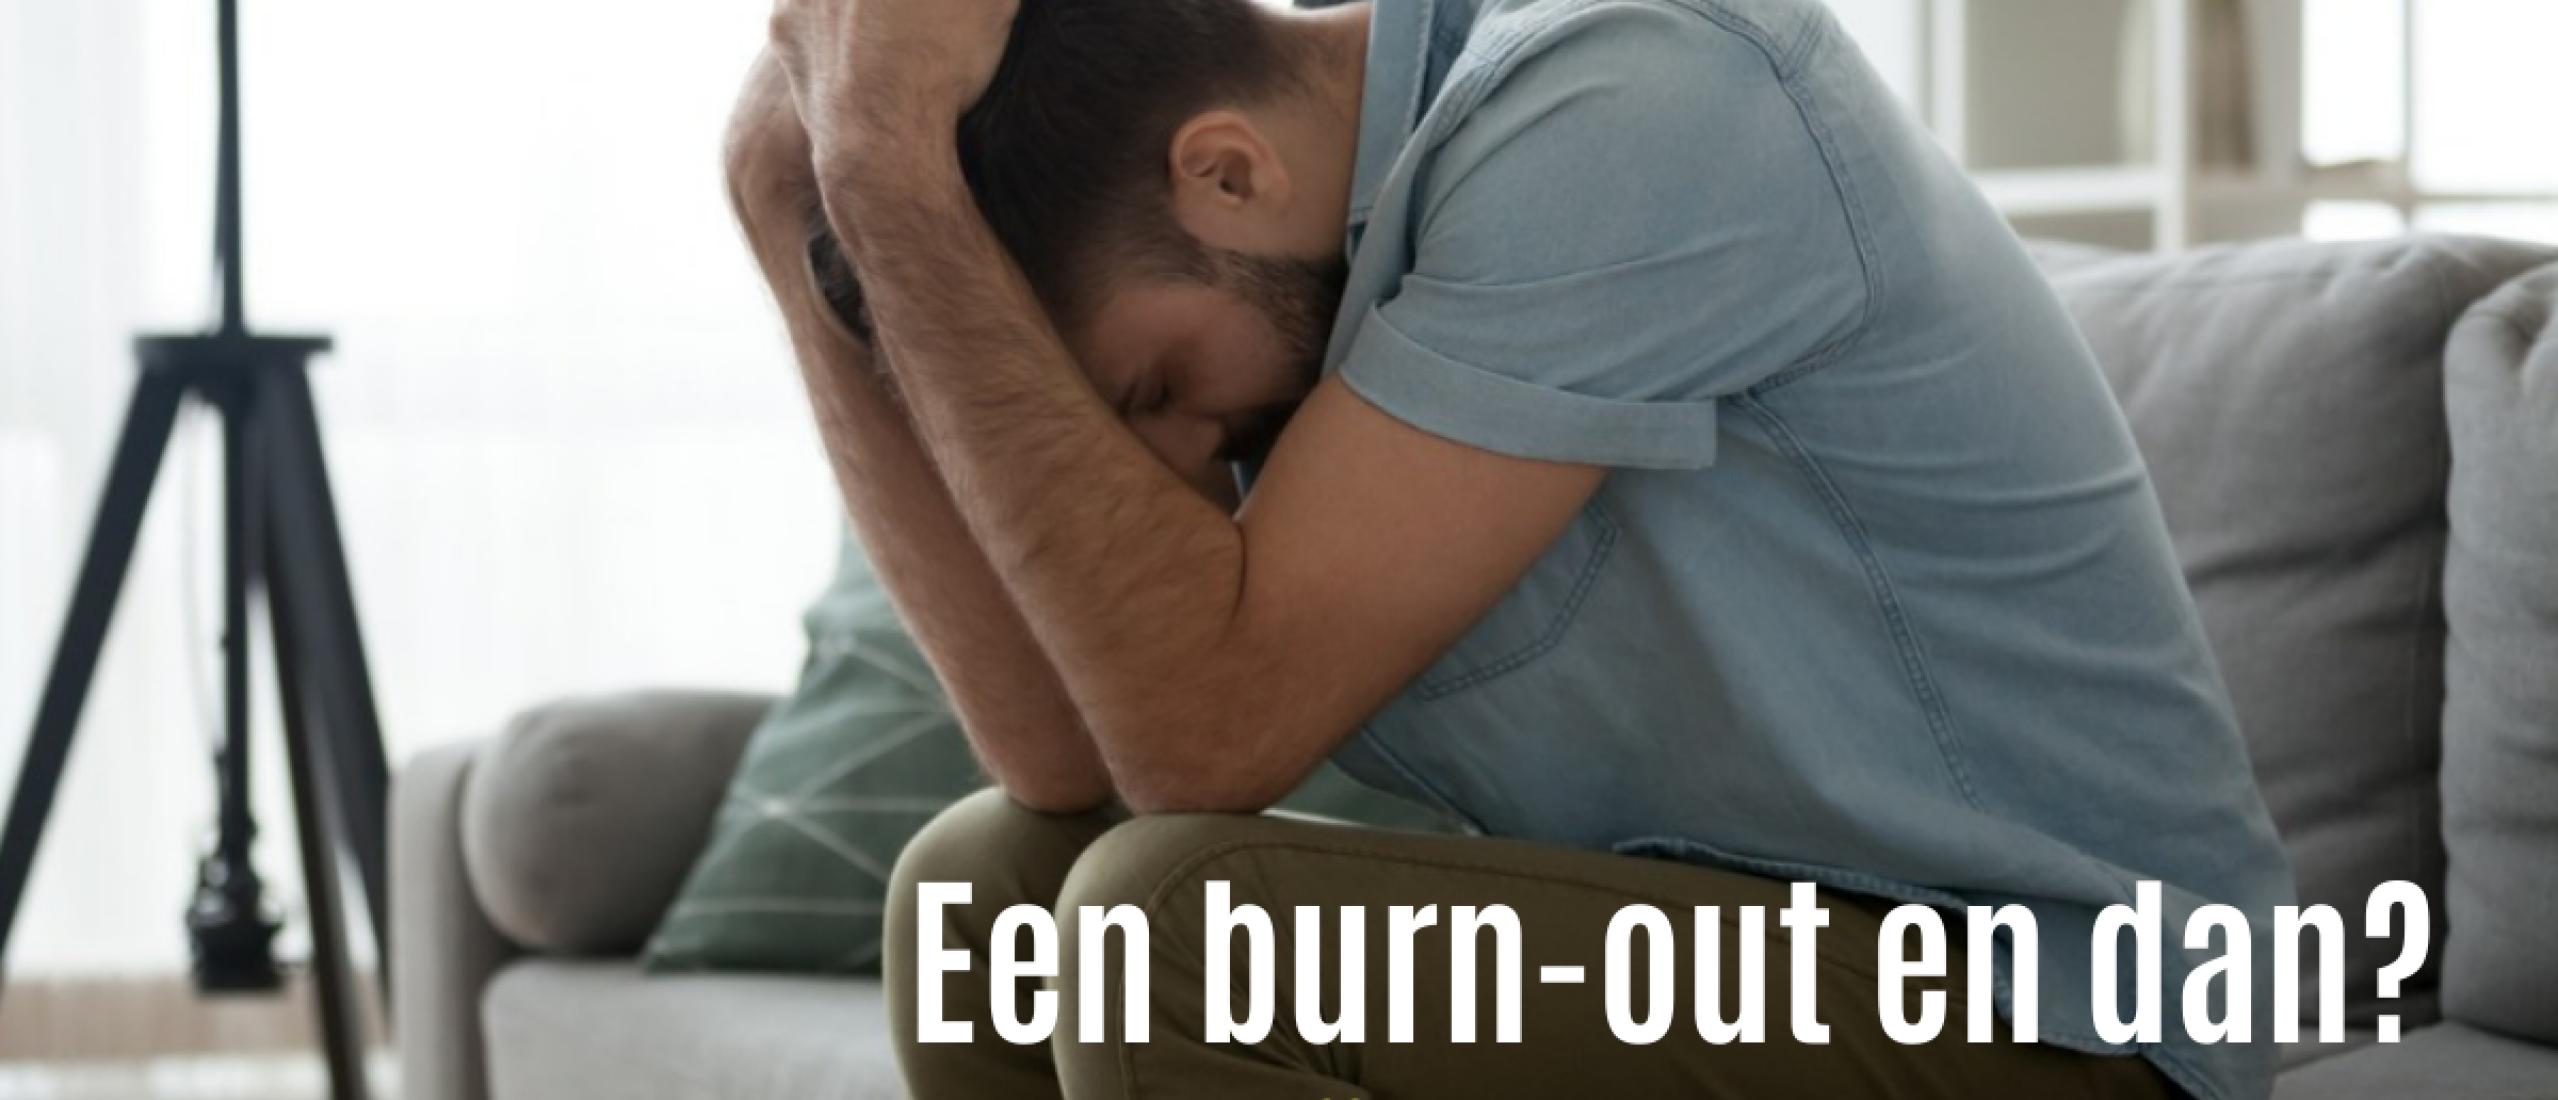 Burn-out verhelpen met Acupunctuur Eindhoven & Best